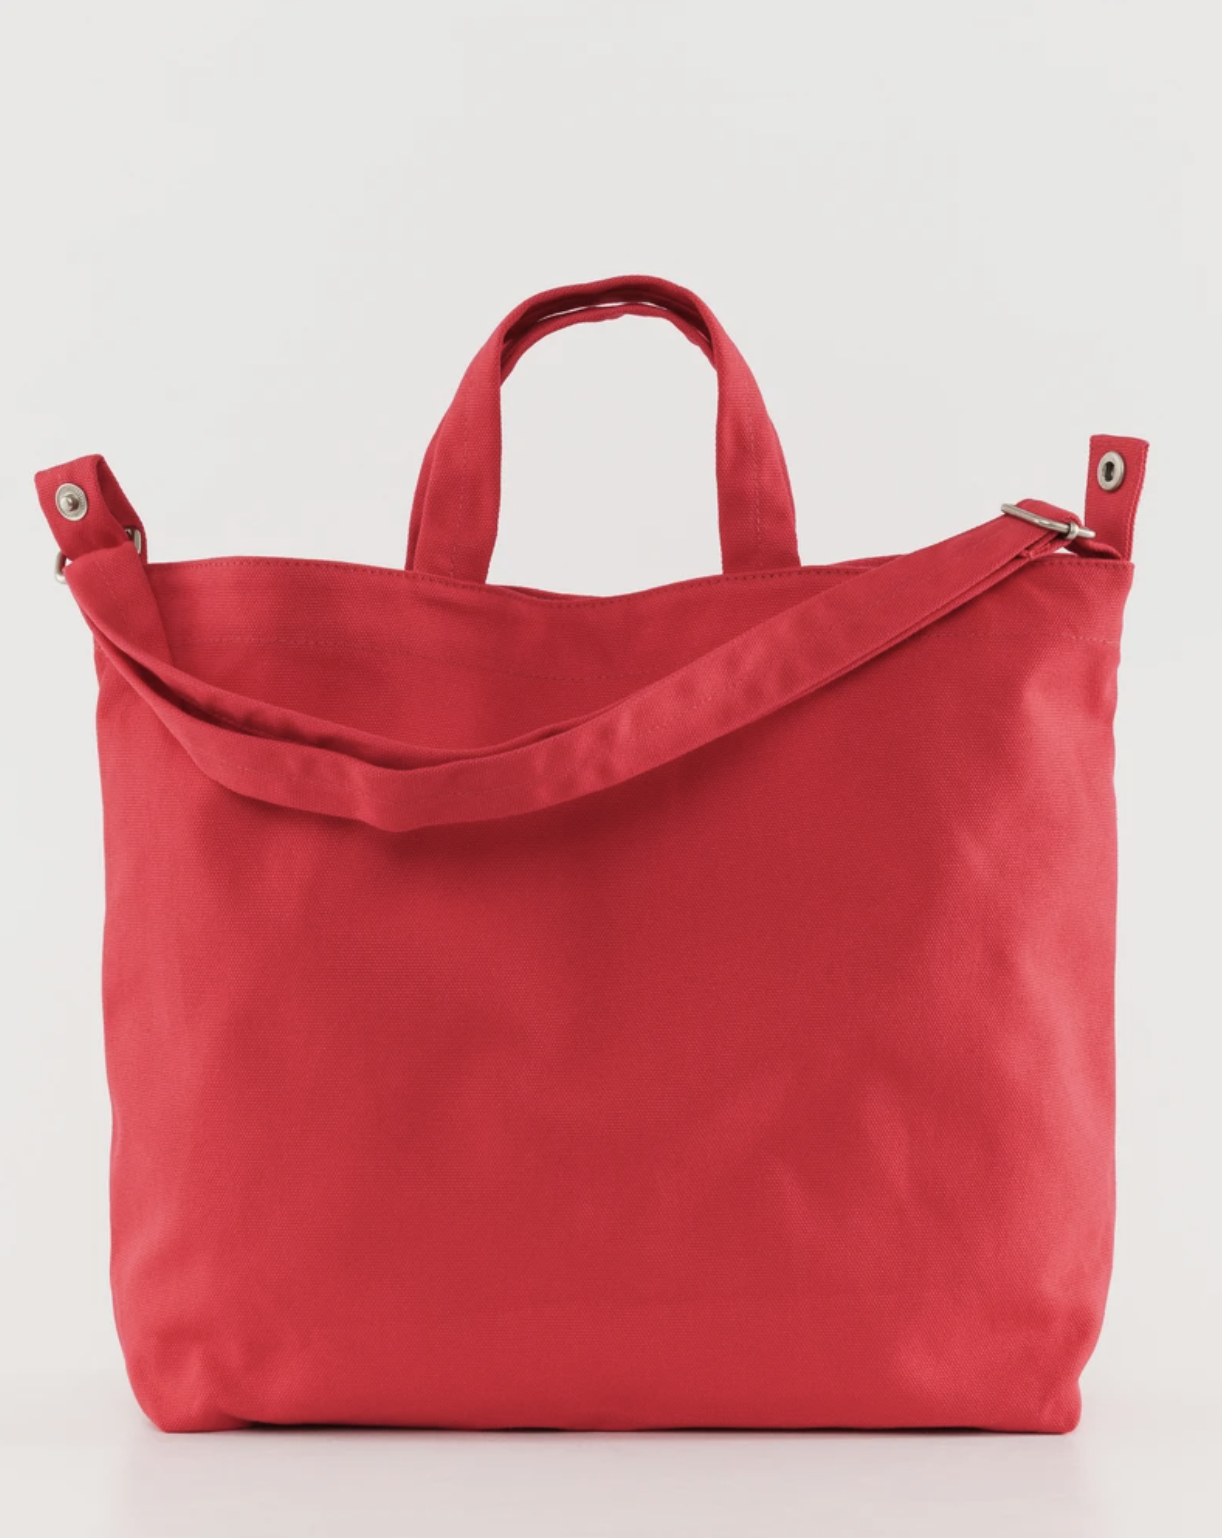 BAGGU - Horizontal Duck Bag, Punch red